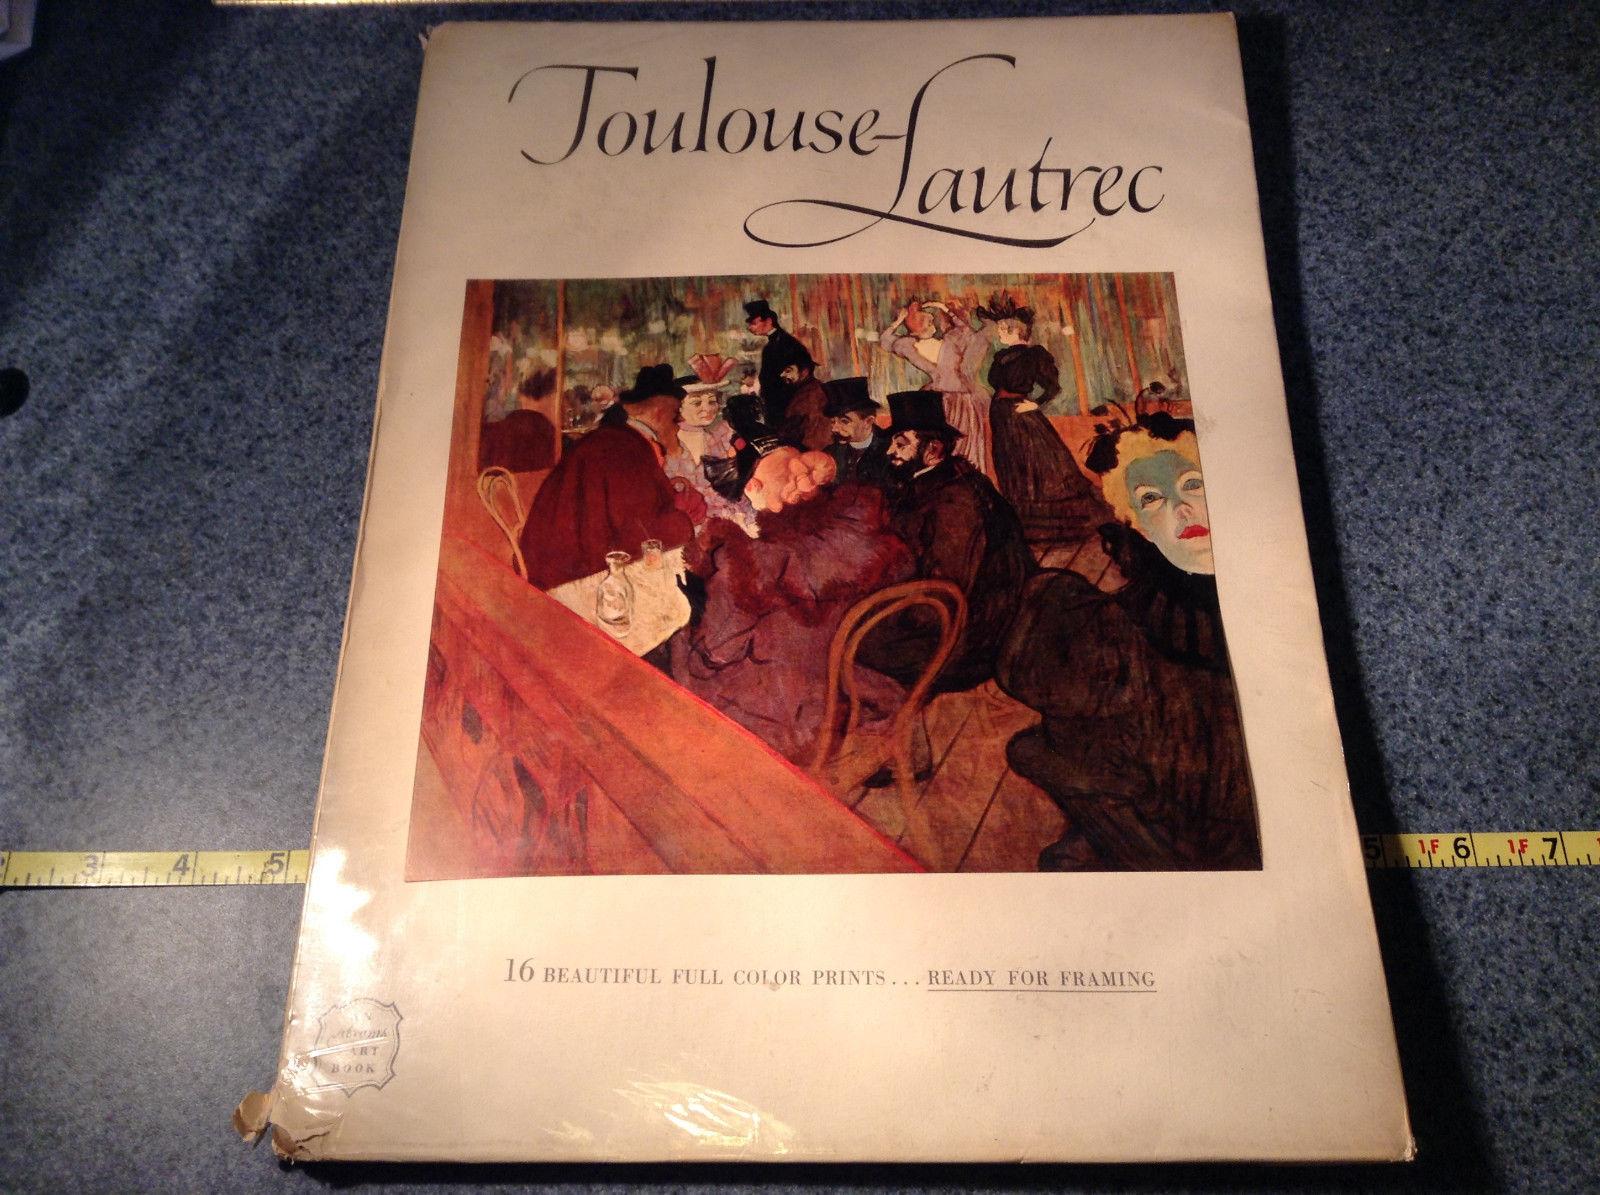 Toulouse Lautrec Book 16 Beautiful Full Color Prints 1952 Excellent Condition